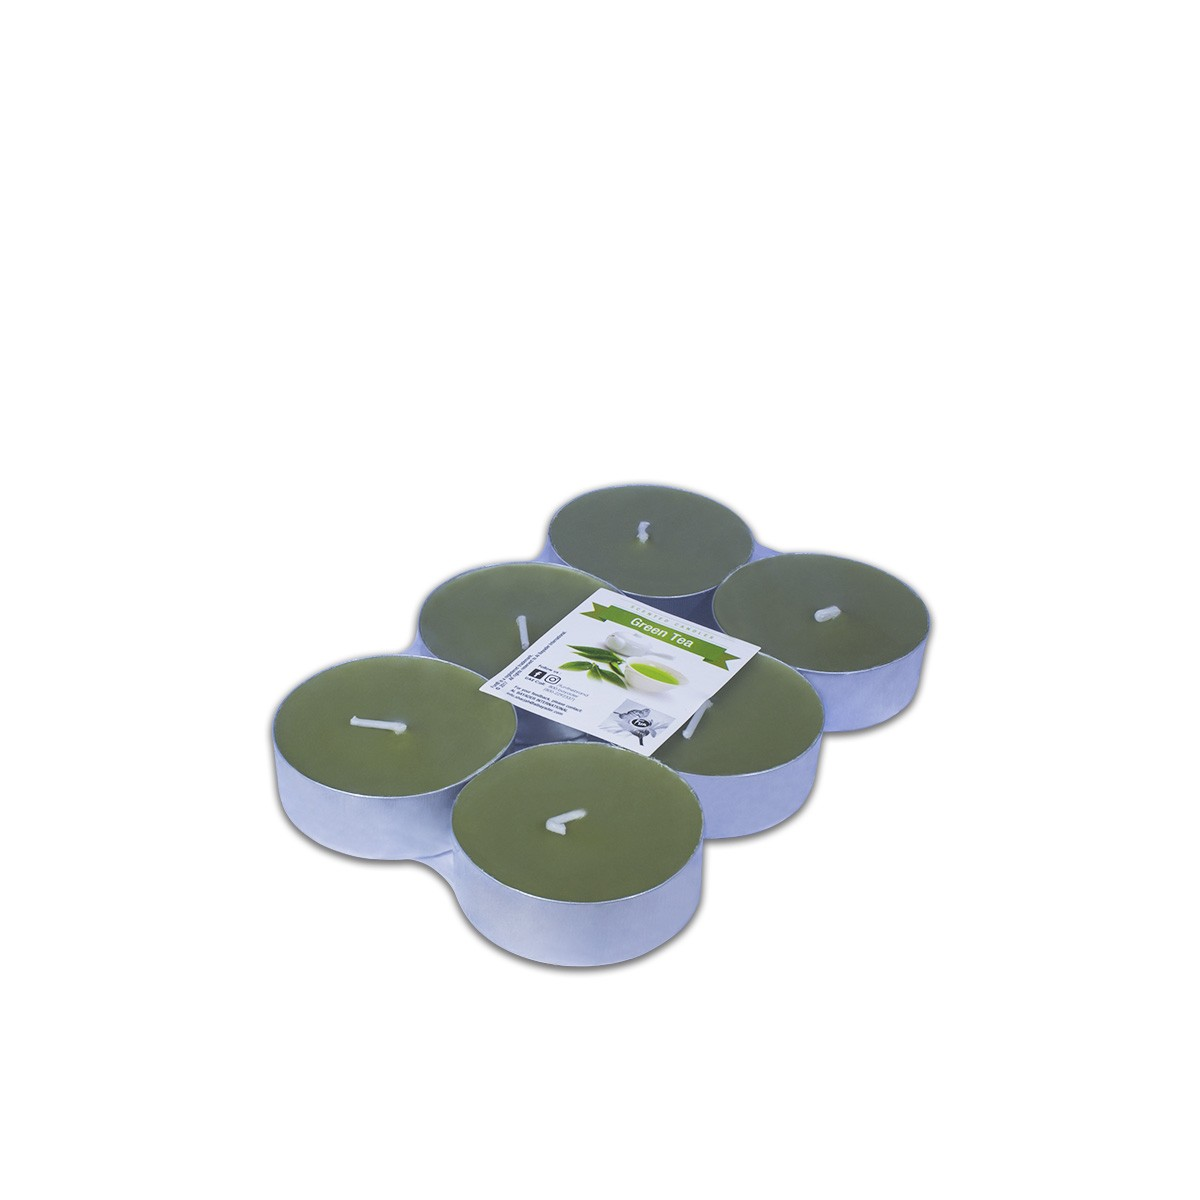 Fun® Scented Maxi-Tealight Candles 5.8x2cm - Green Tea | 6pcsx6pkts